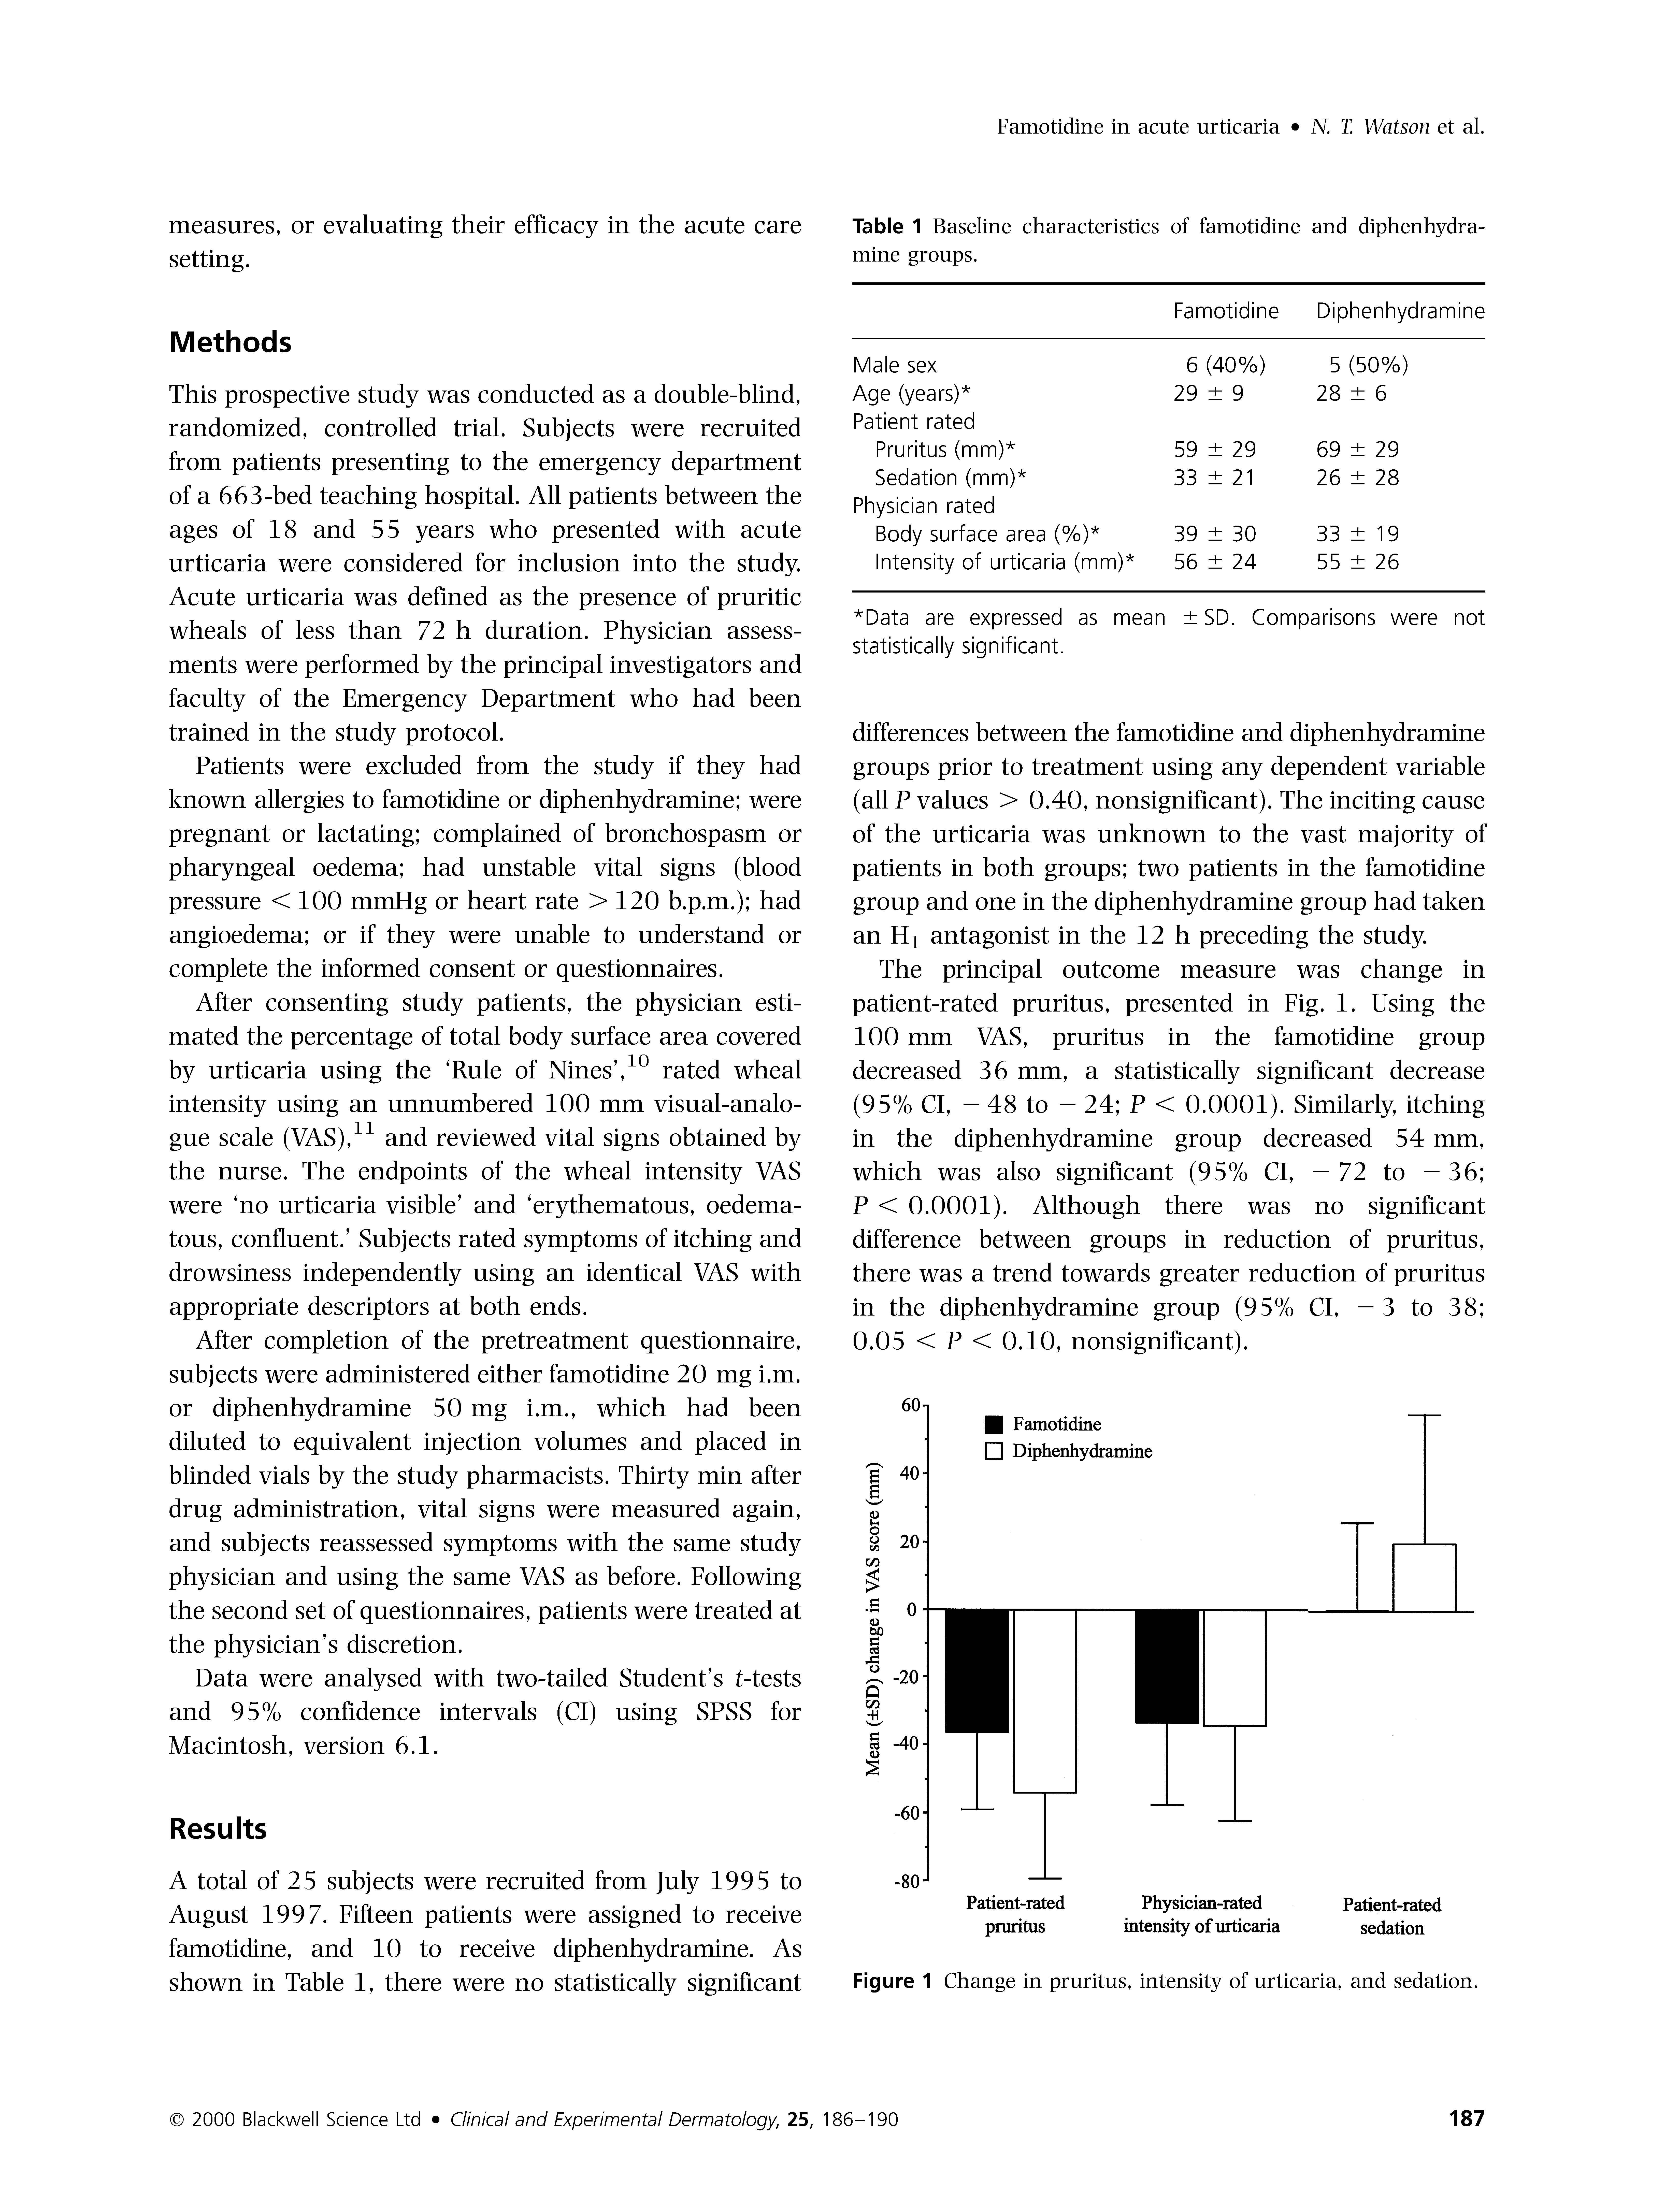 Famotidine in the treatment of acute urticaria_頁面_2.jpg